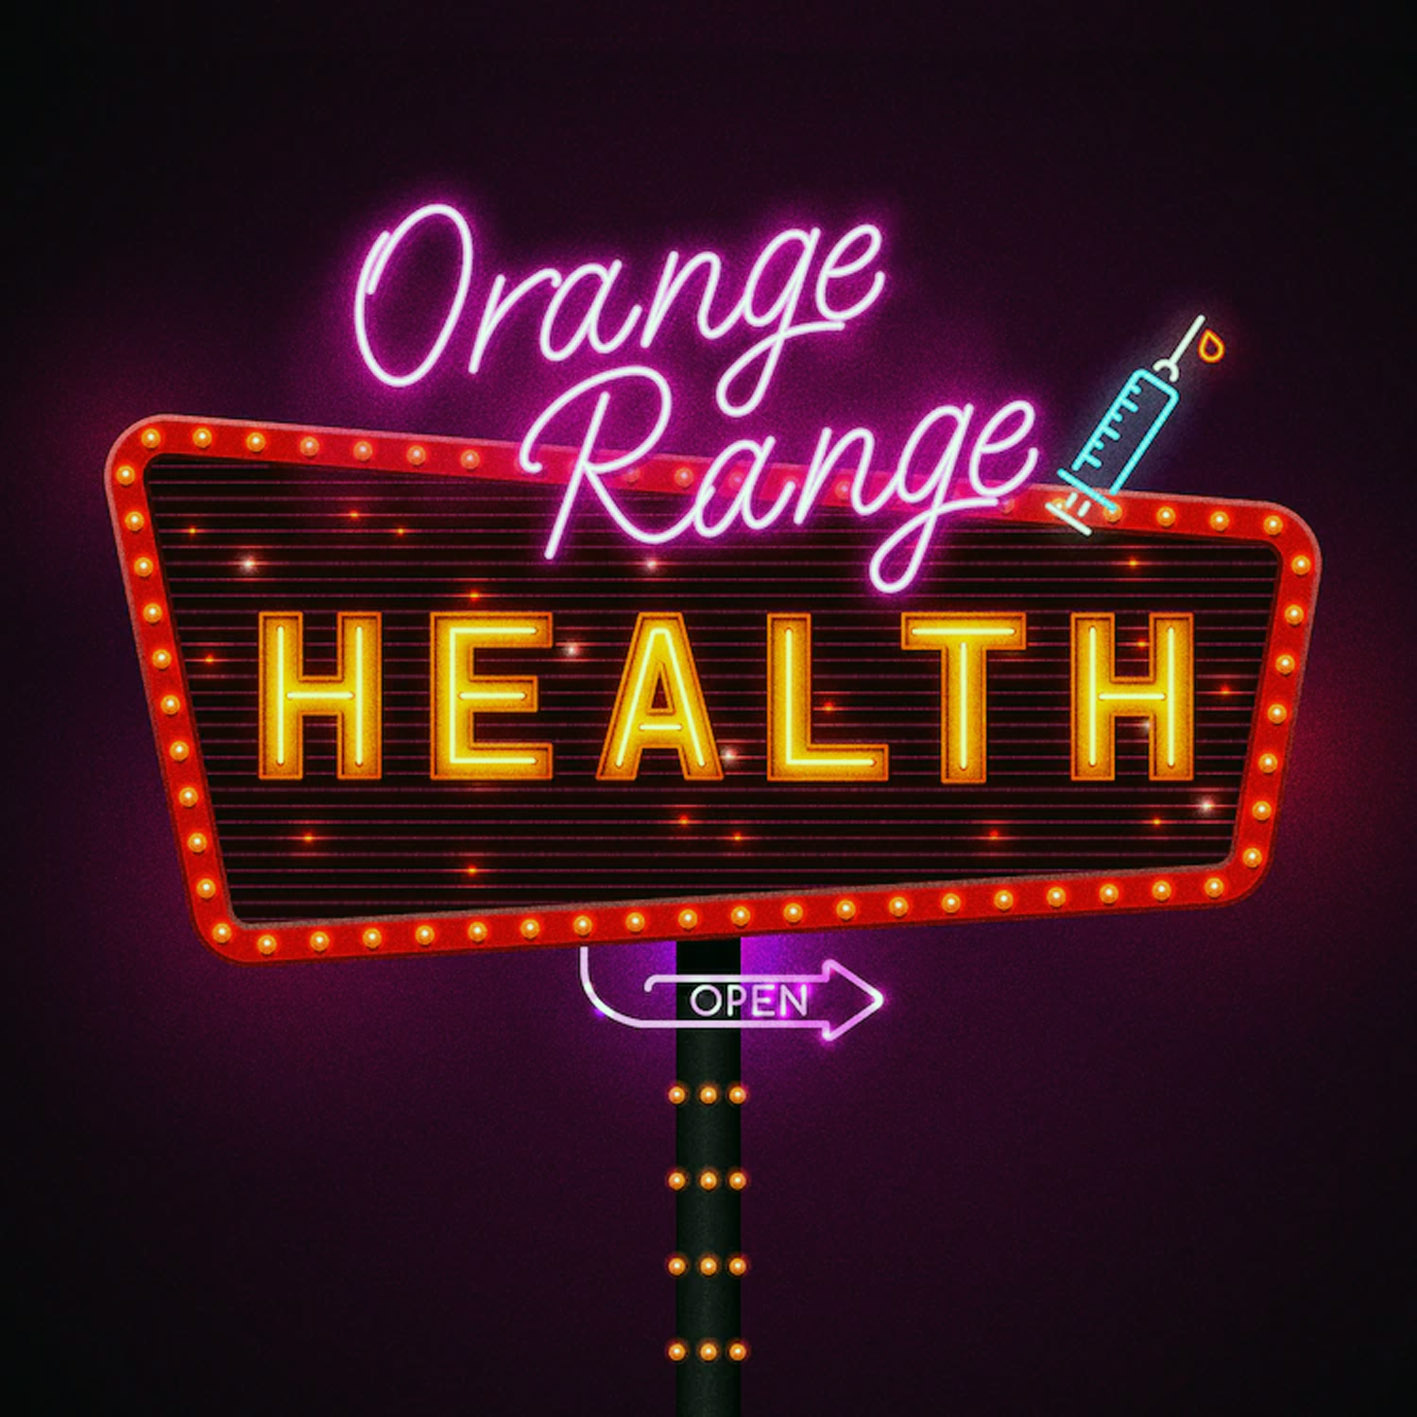 ORANGE RANGE - HEALTH